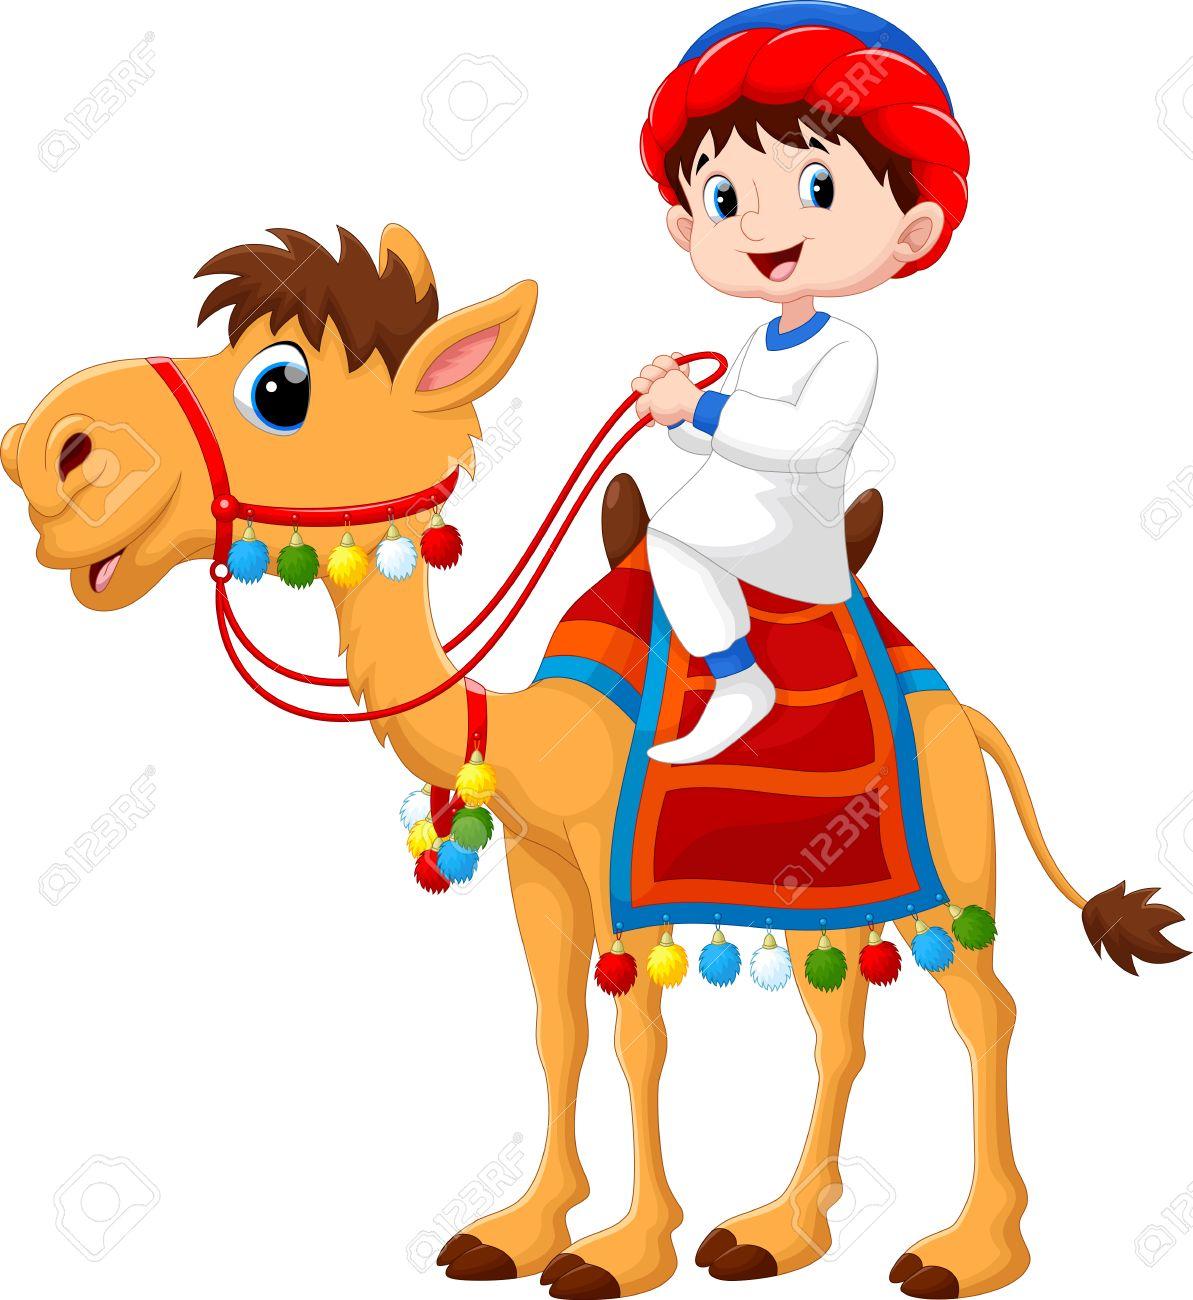 Illustration of Arab boy riding a camel - 48779727